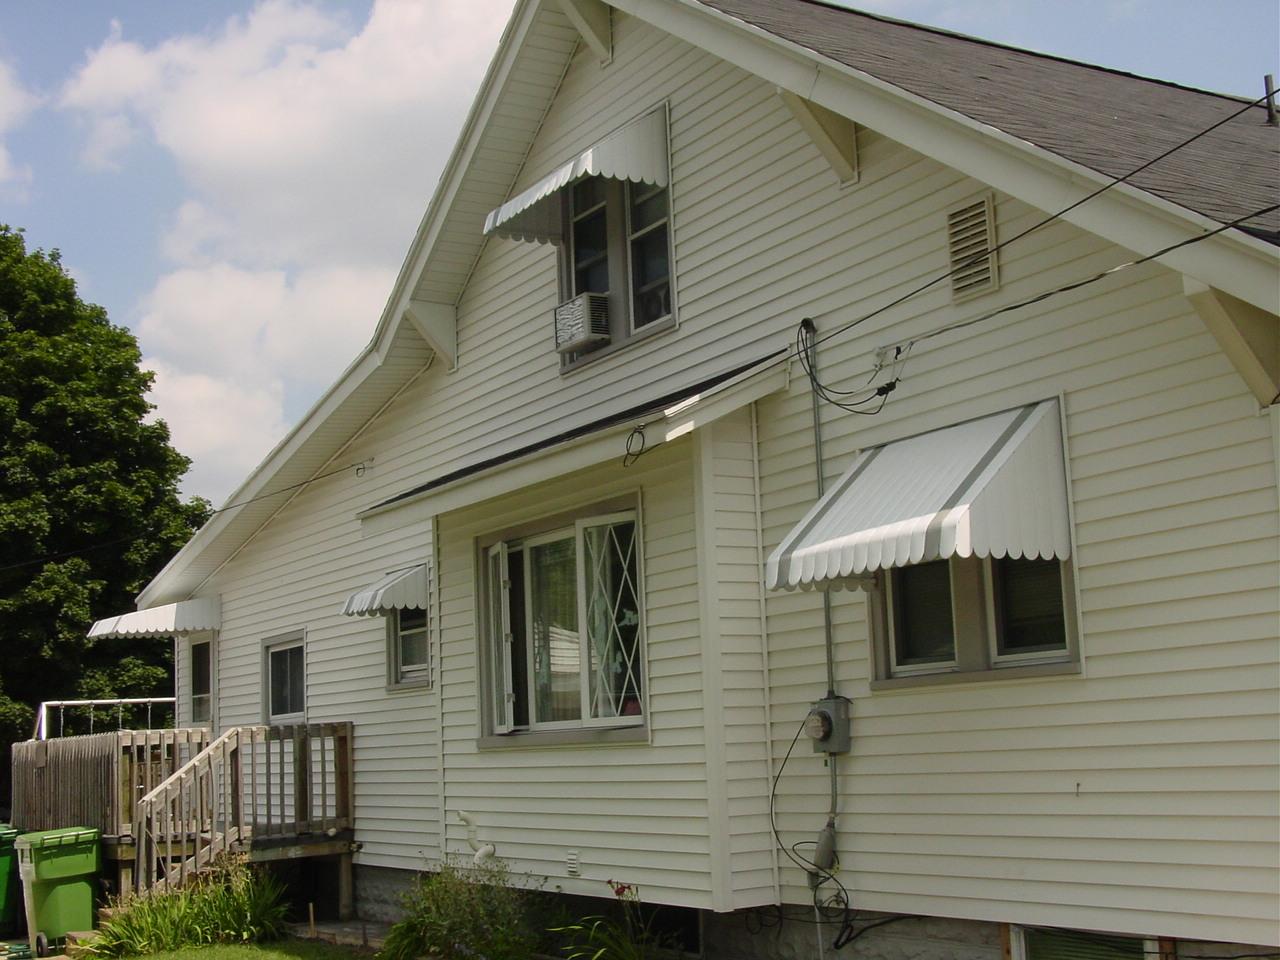 HOME-metal-window-awnings-12 - Muskegon - Awning & Fabrication